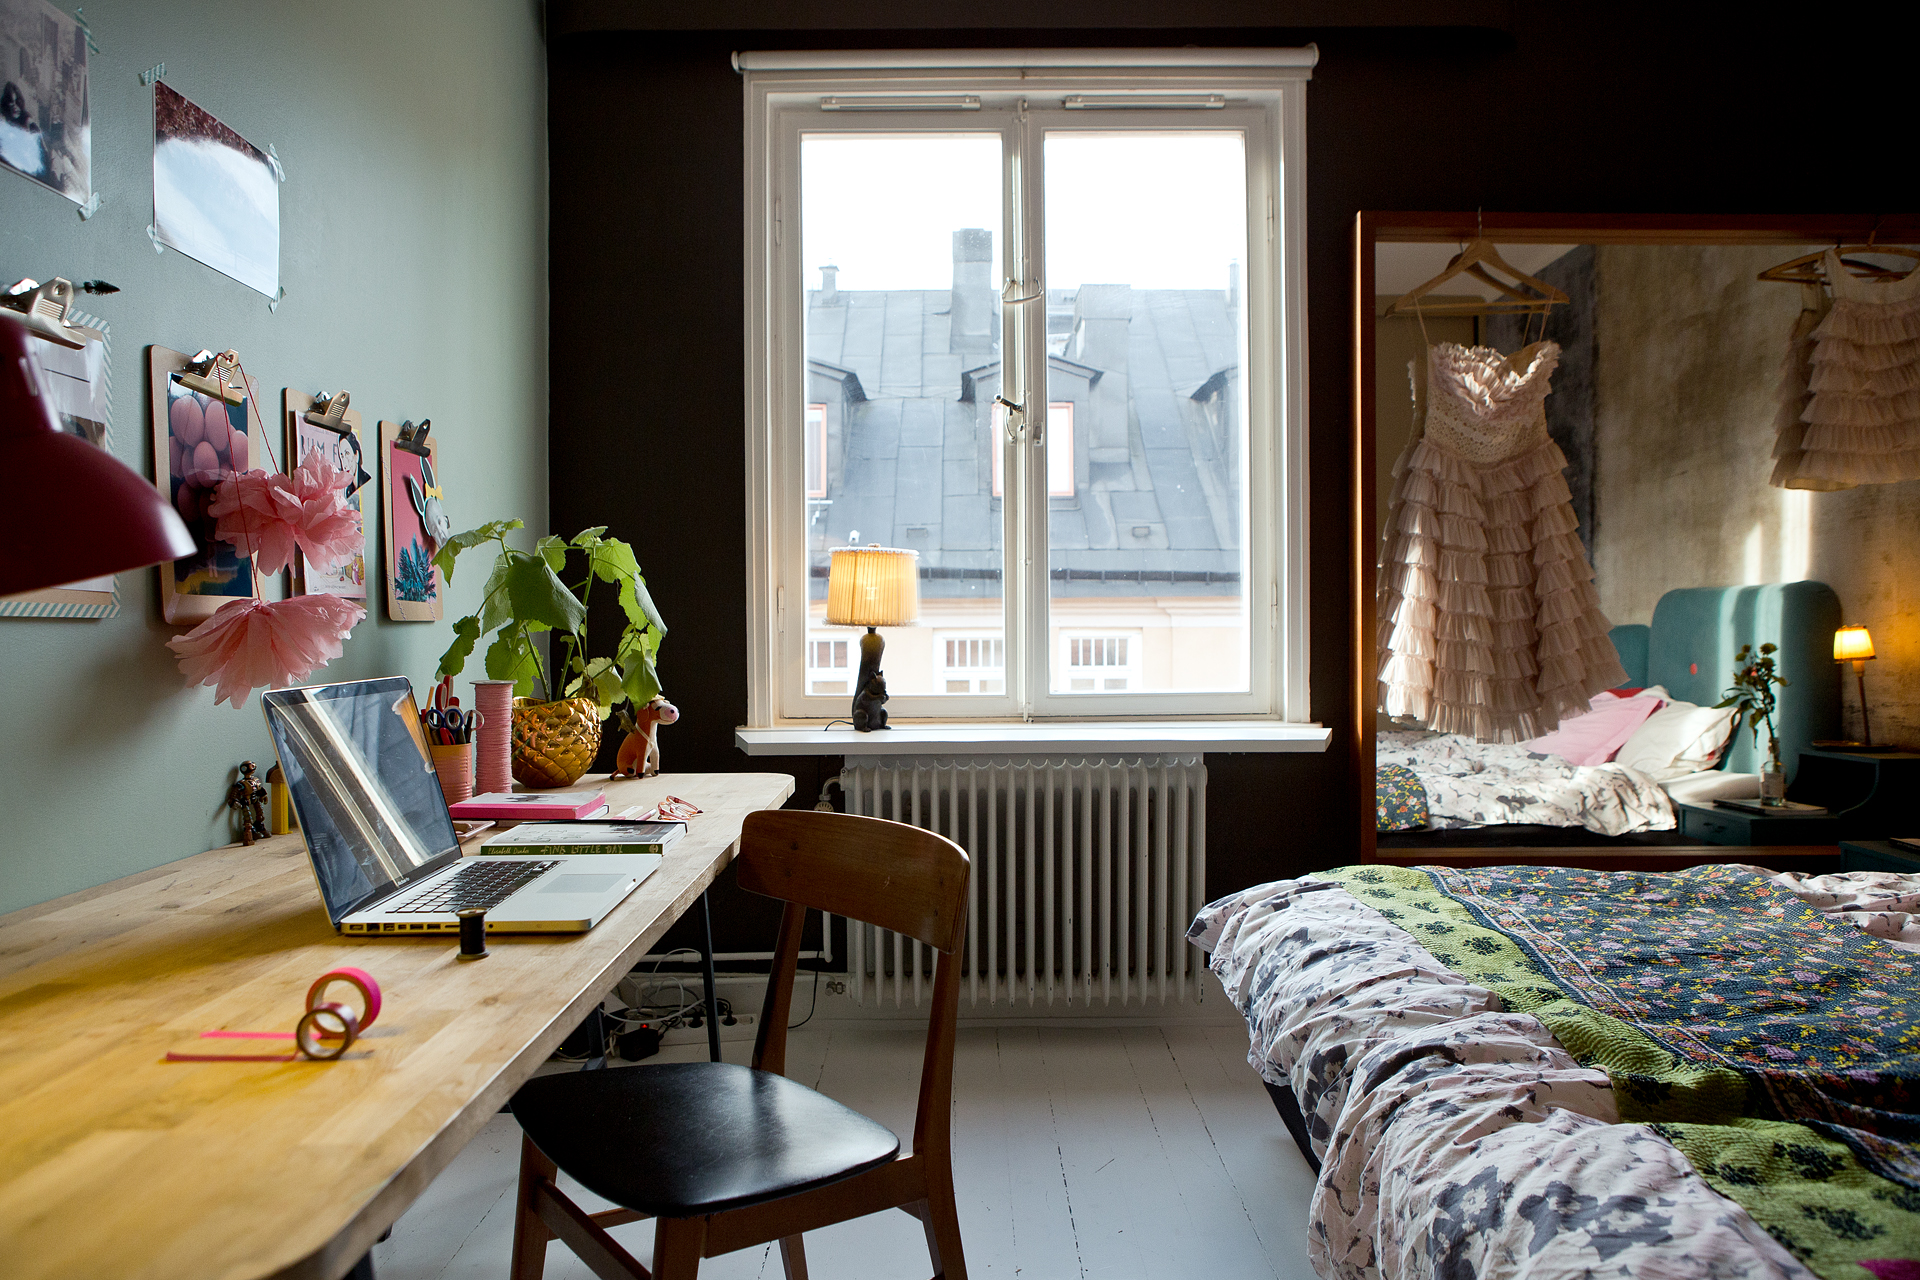 wohnungsinserat aus stockholm sweet home. Black Bedroom Furniture Sets. Home Design Ideas